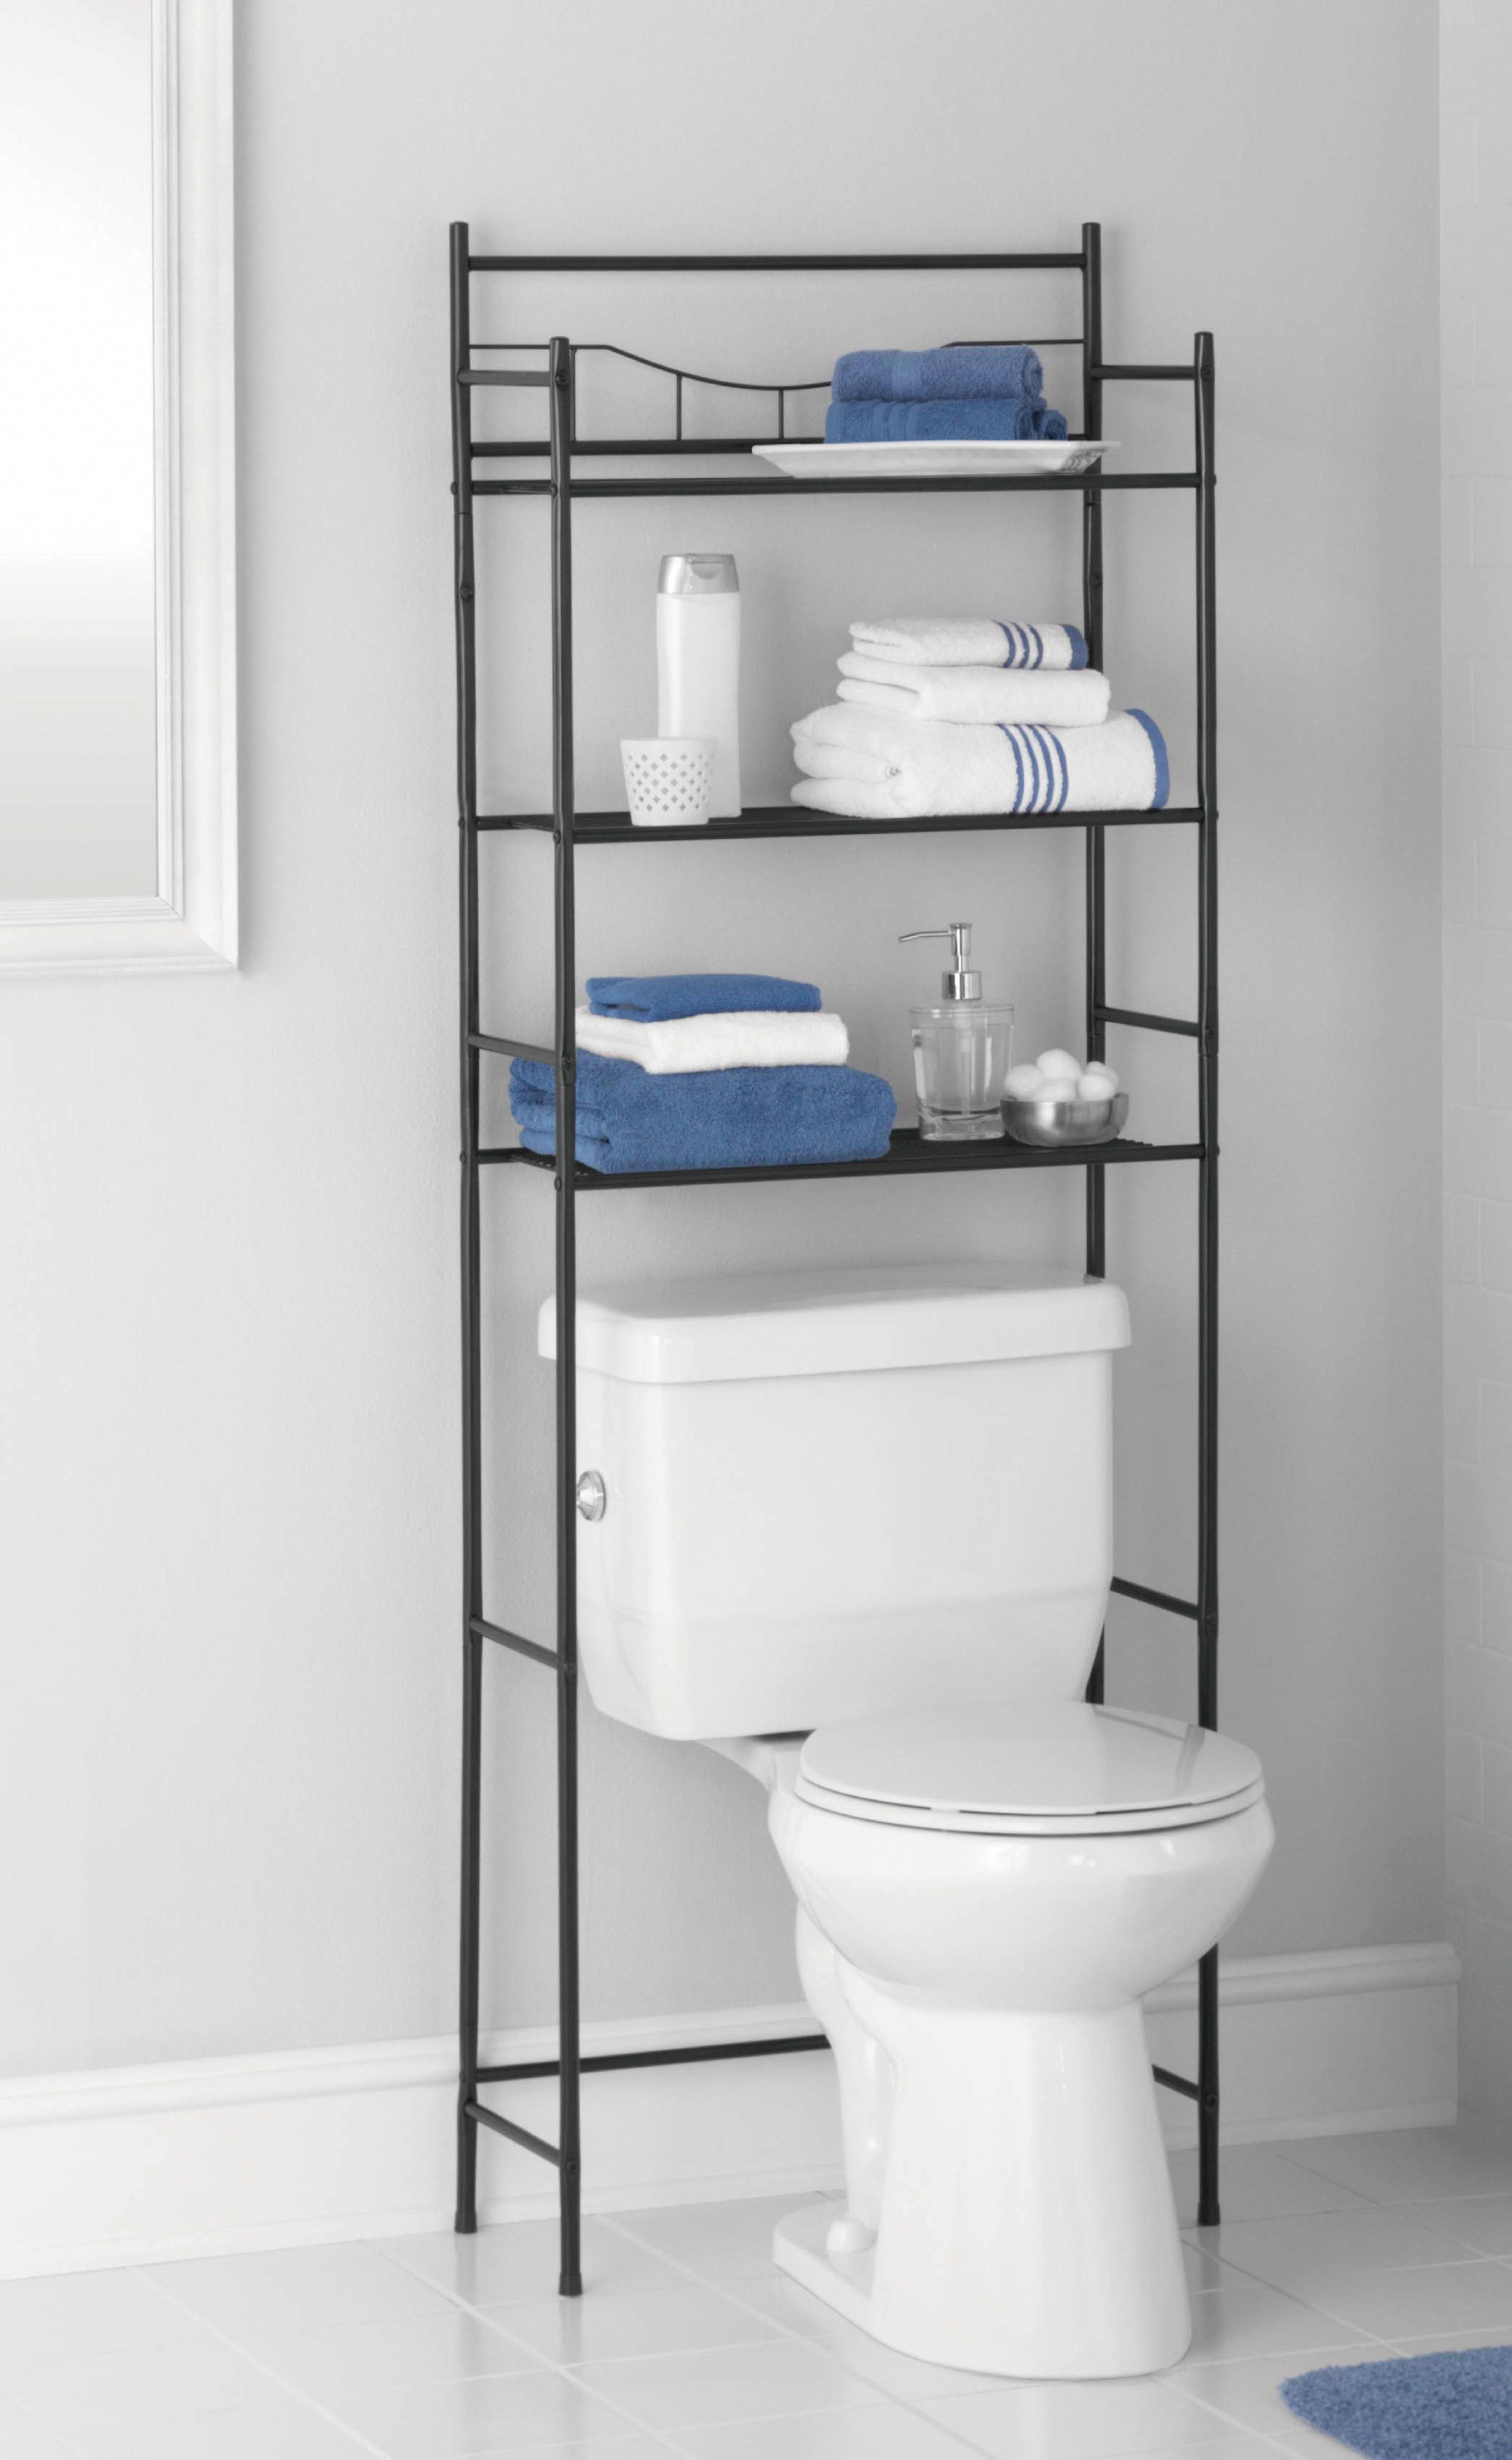 Mainstays 3 Shelf Bathroom Over The Toilet Space Saver With Liner Oil Rubbed Bronze Walmart Com In 2021 Bathroom Space Saver Small Bathroom Storage Trendy Bathroom